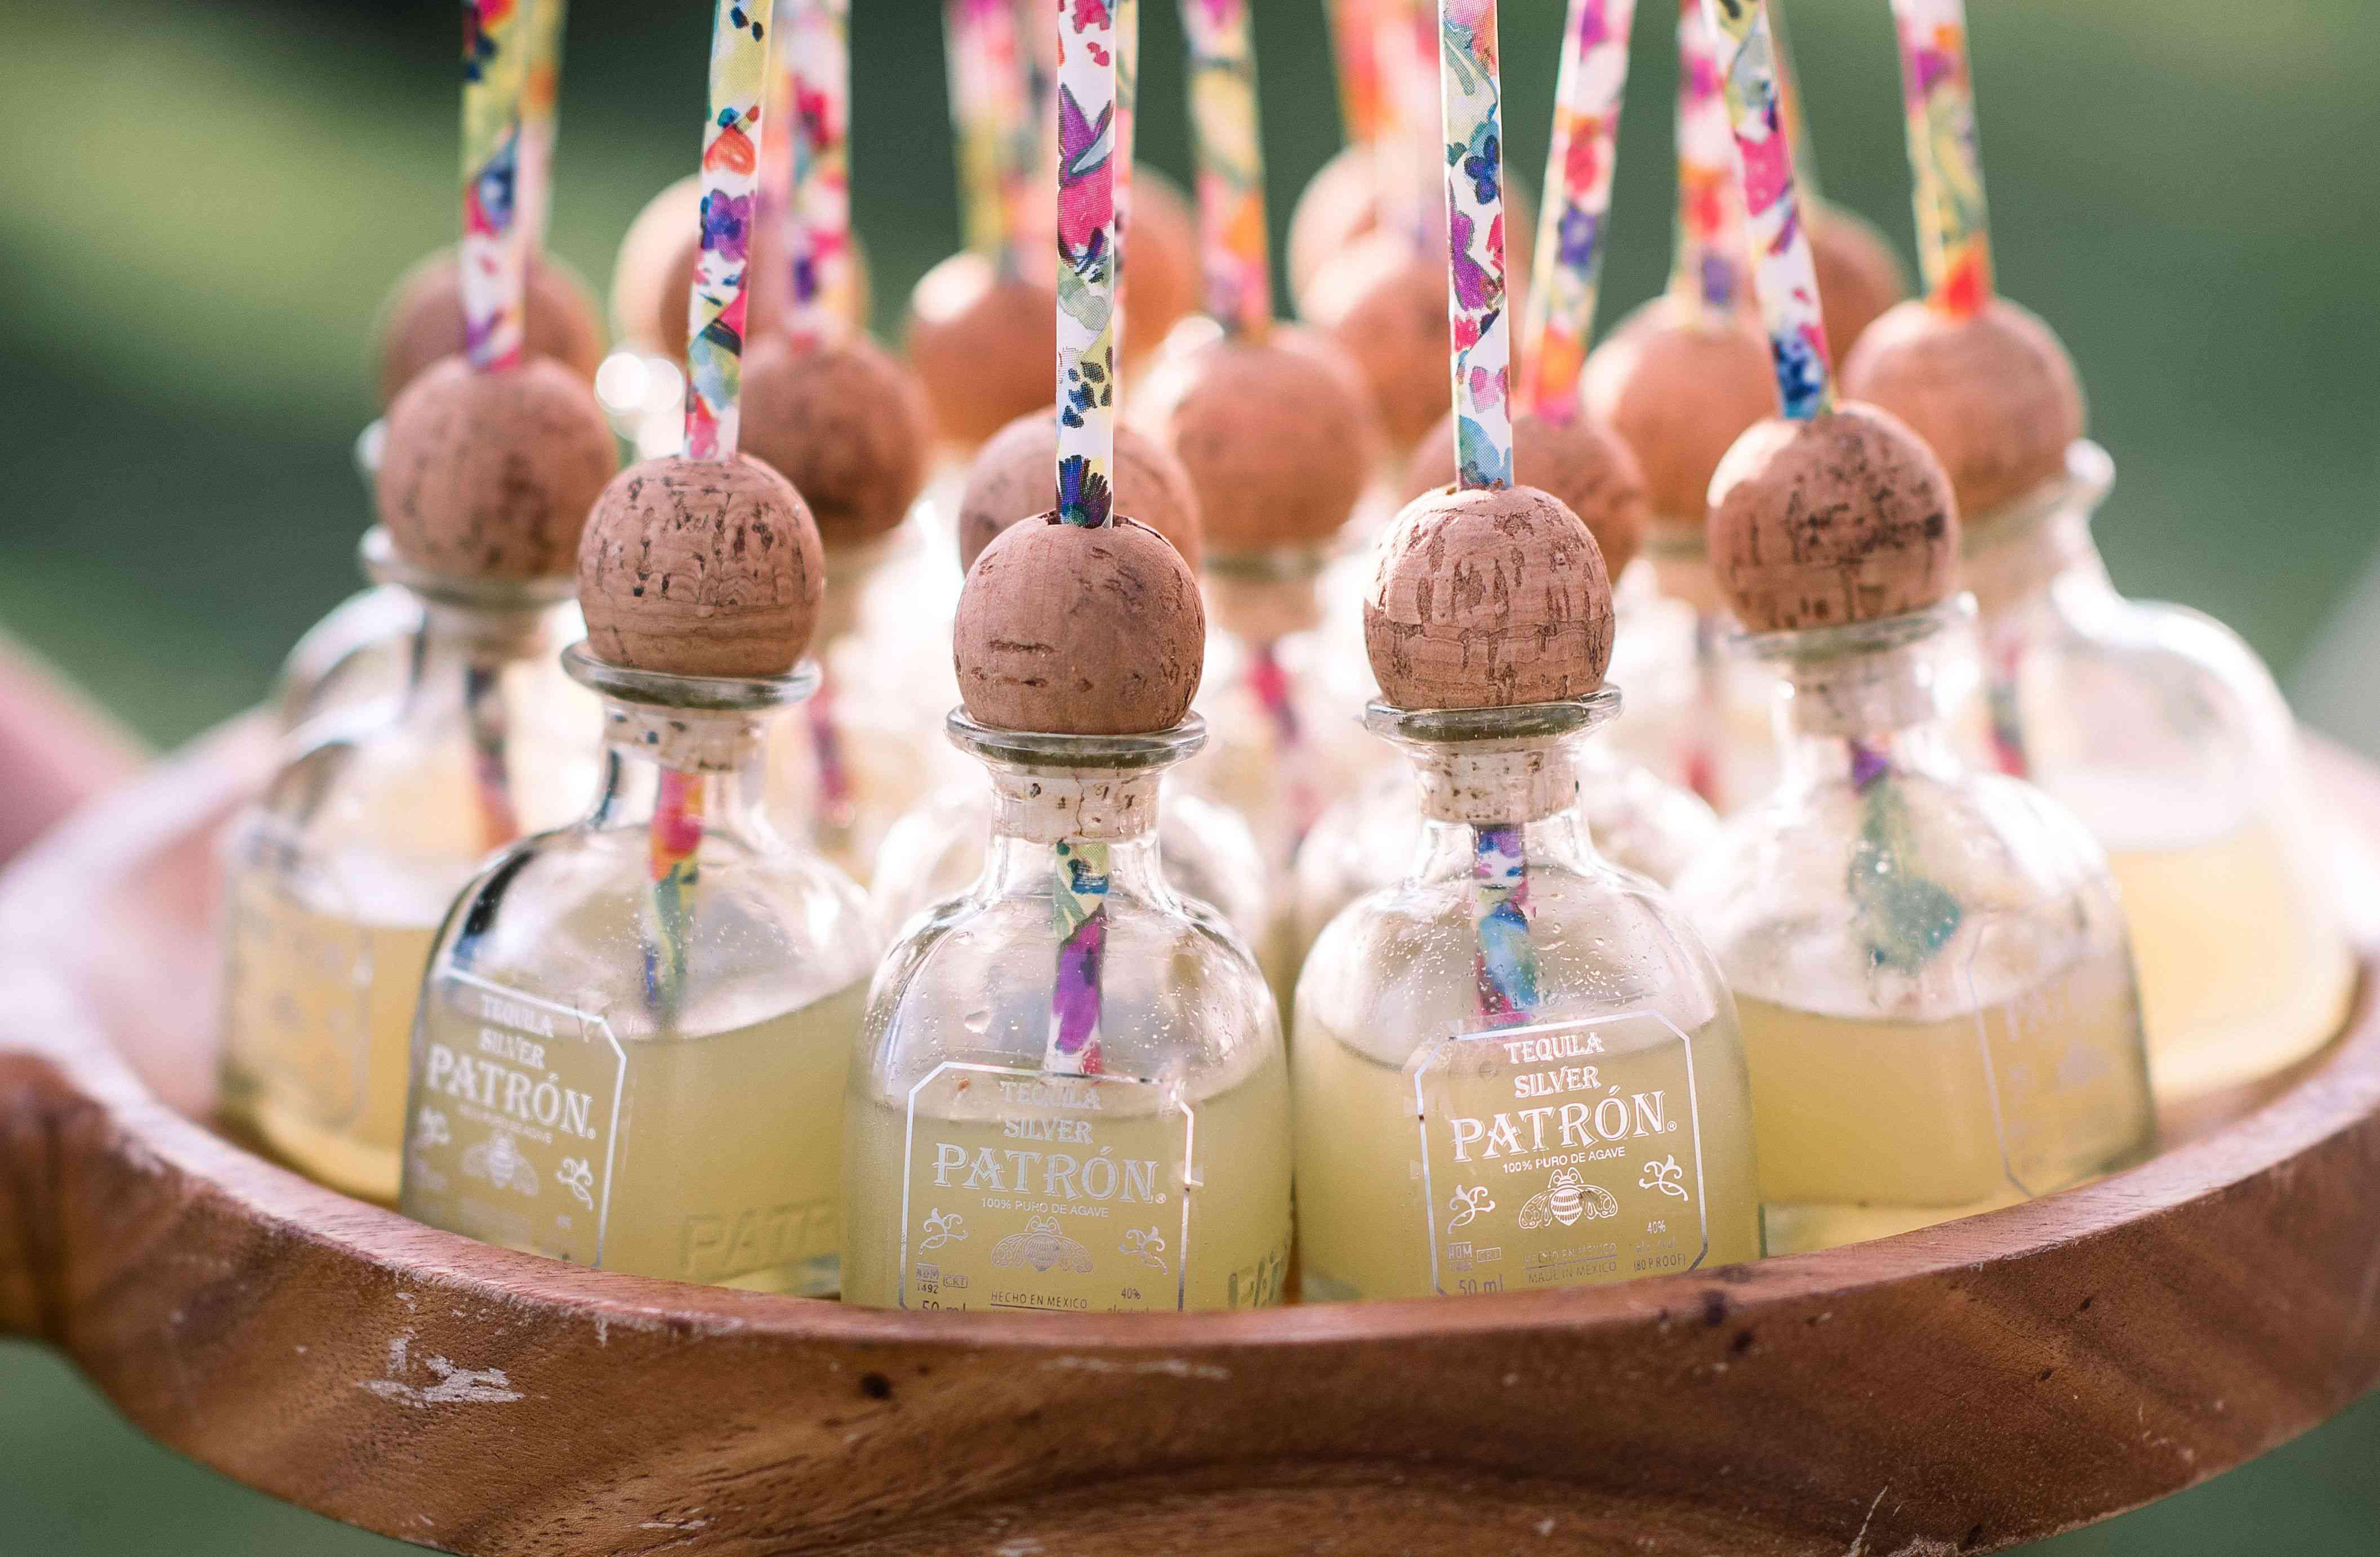 Tray of margaritas in mini Patron bottles with straws